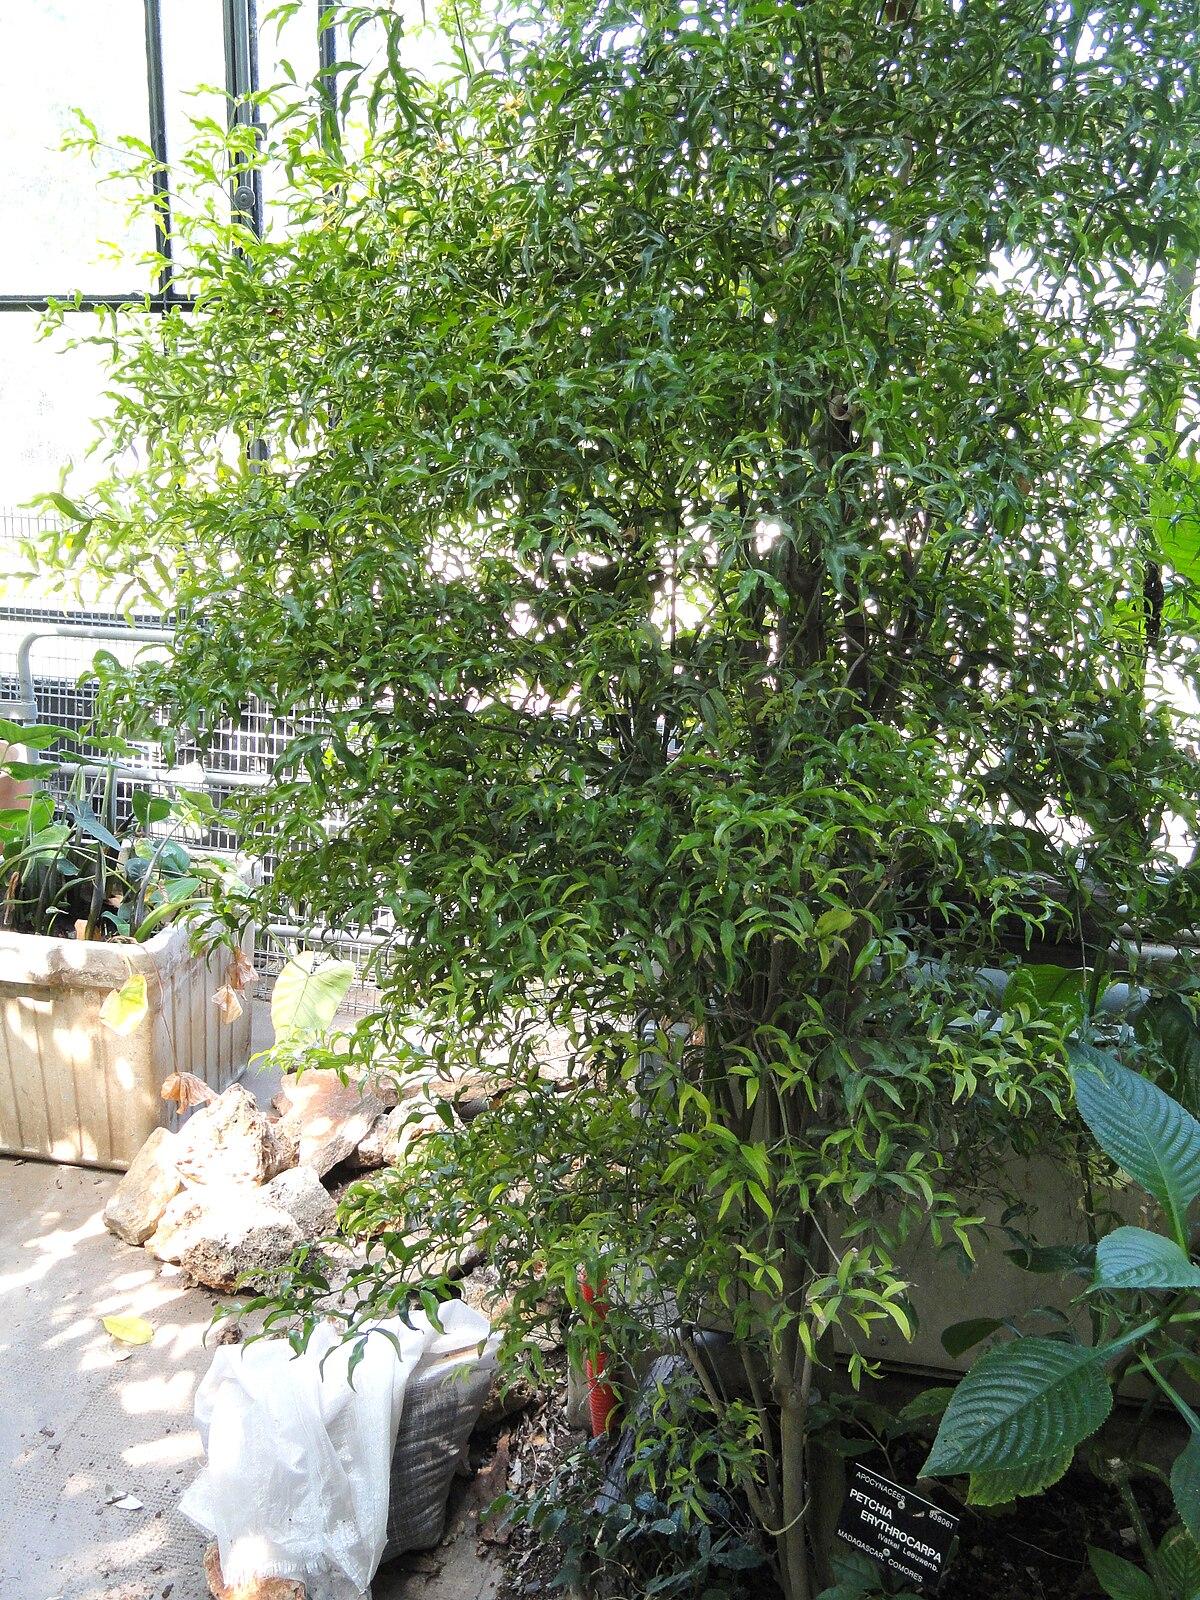 Petchia wikipedia la enciclopedia libre for Bal des citrouilles jardin botanique